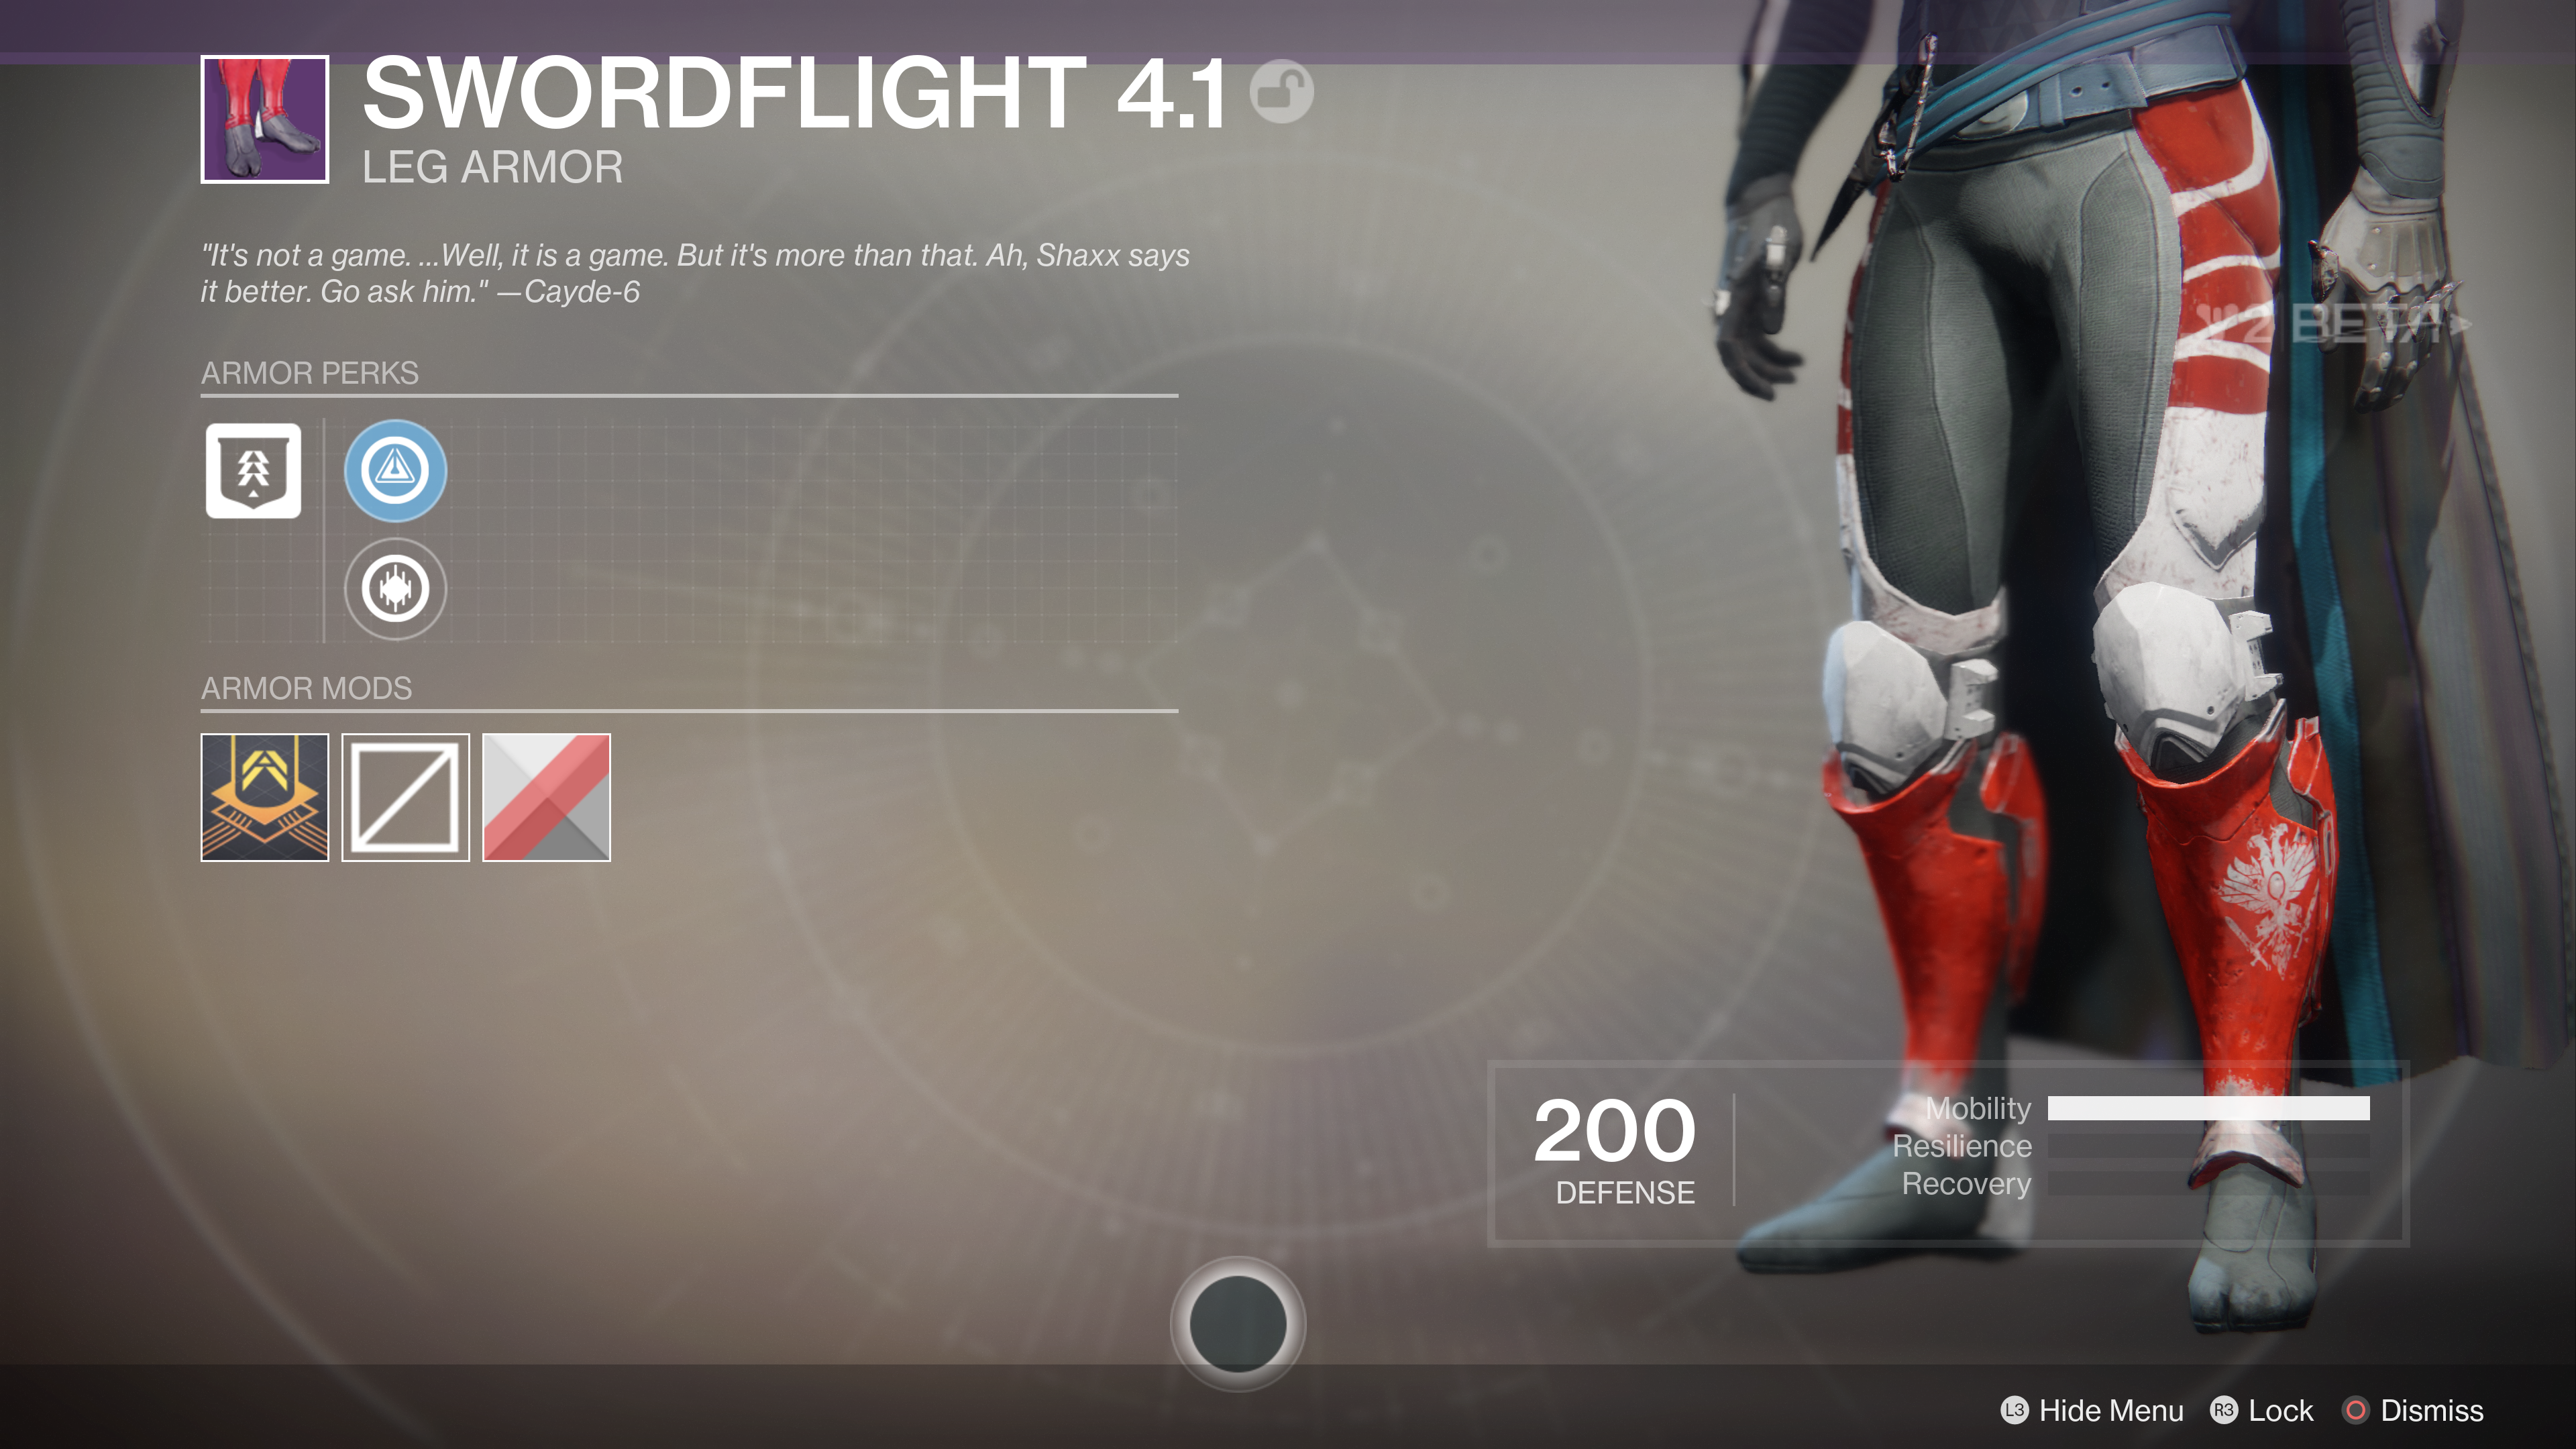 destiny 2 beta swordflight 4.1 legs